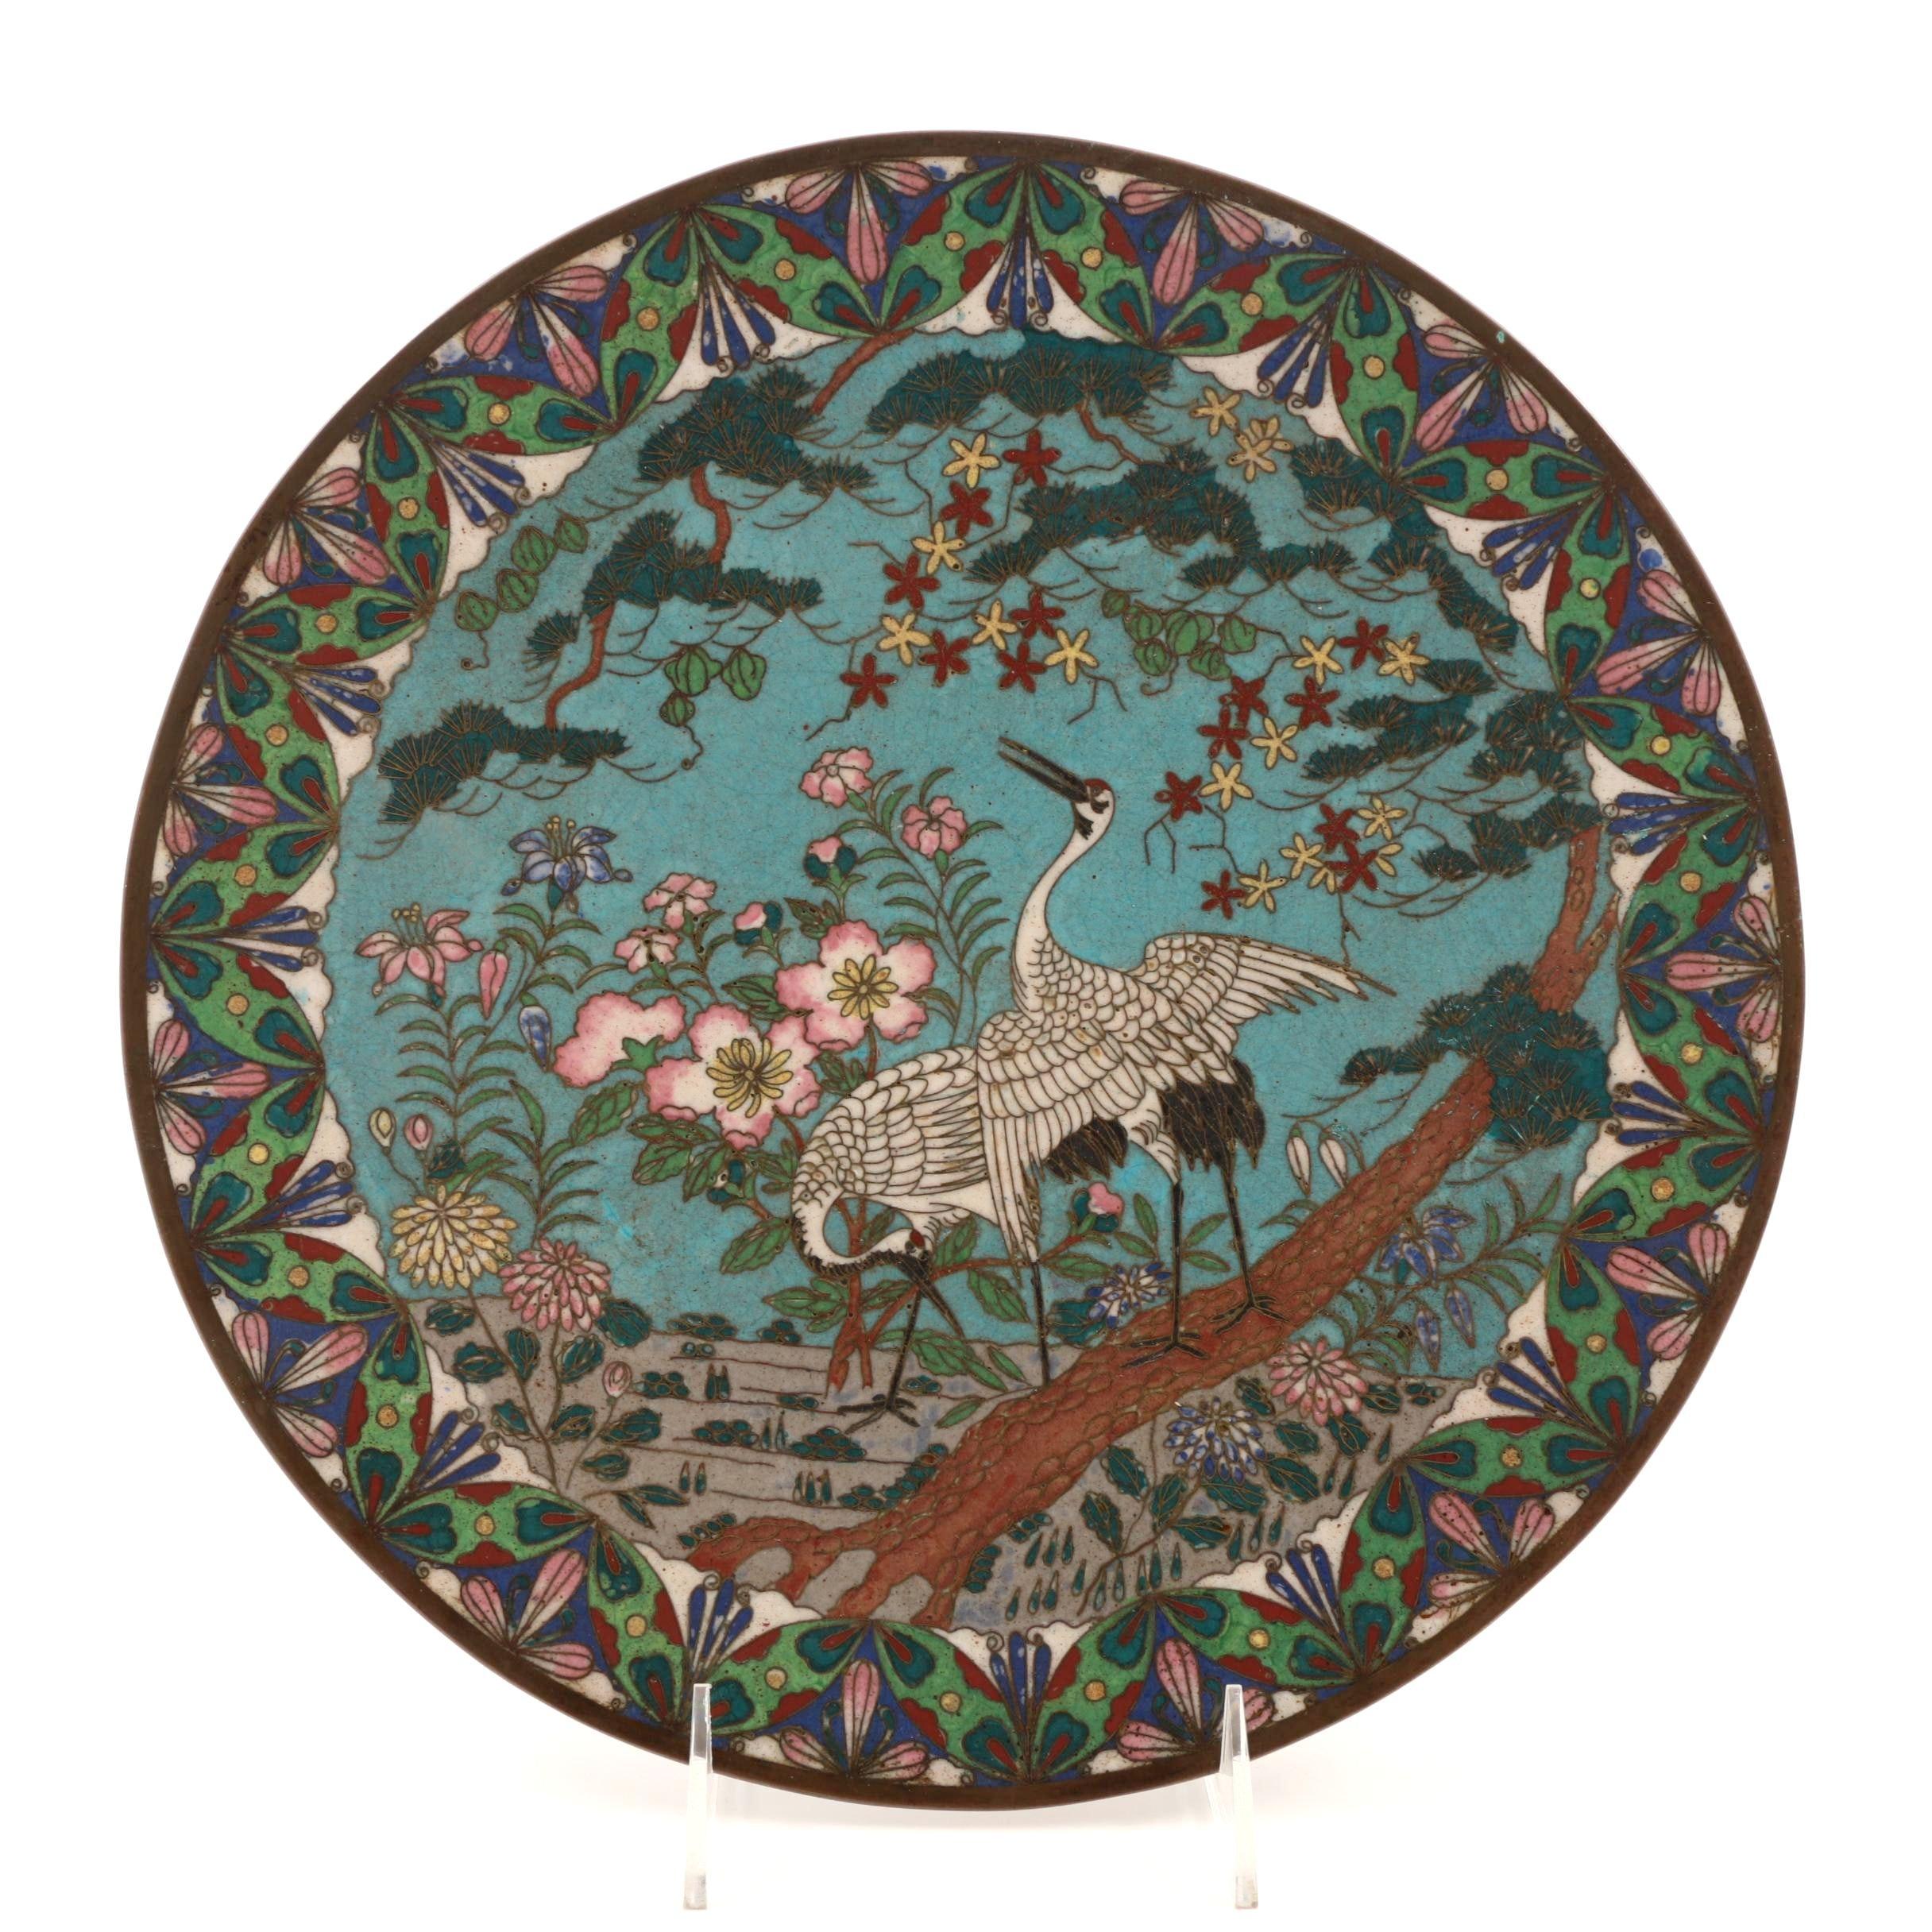 19th Century Japanese Meiji Period Cloisonné Plate